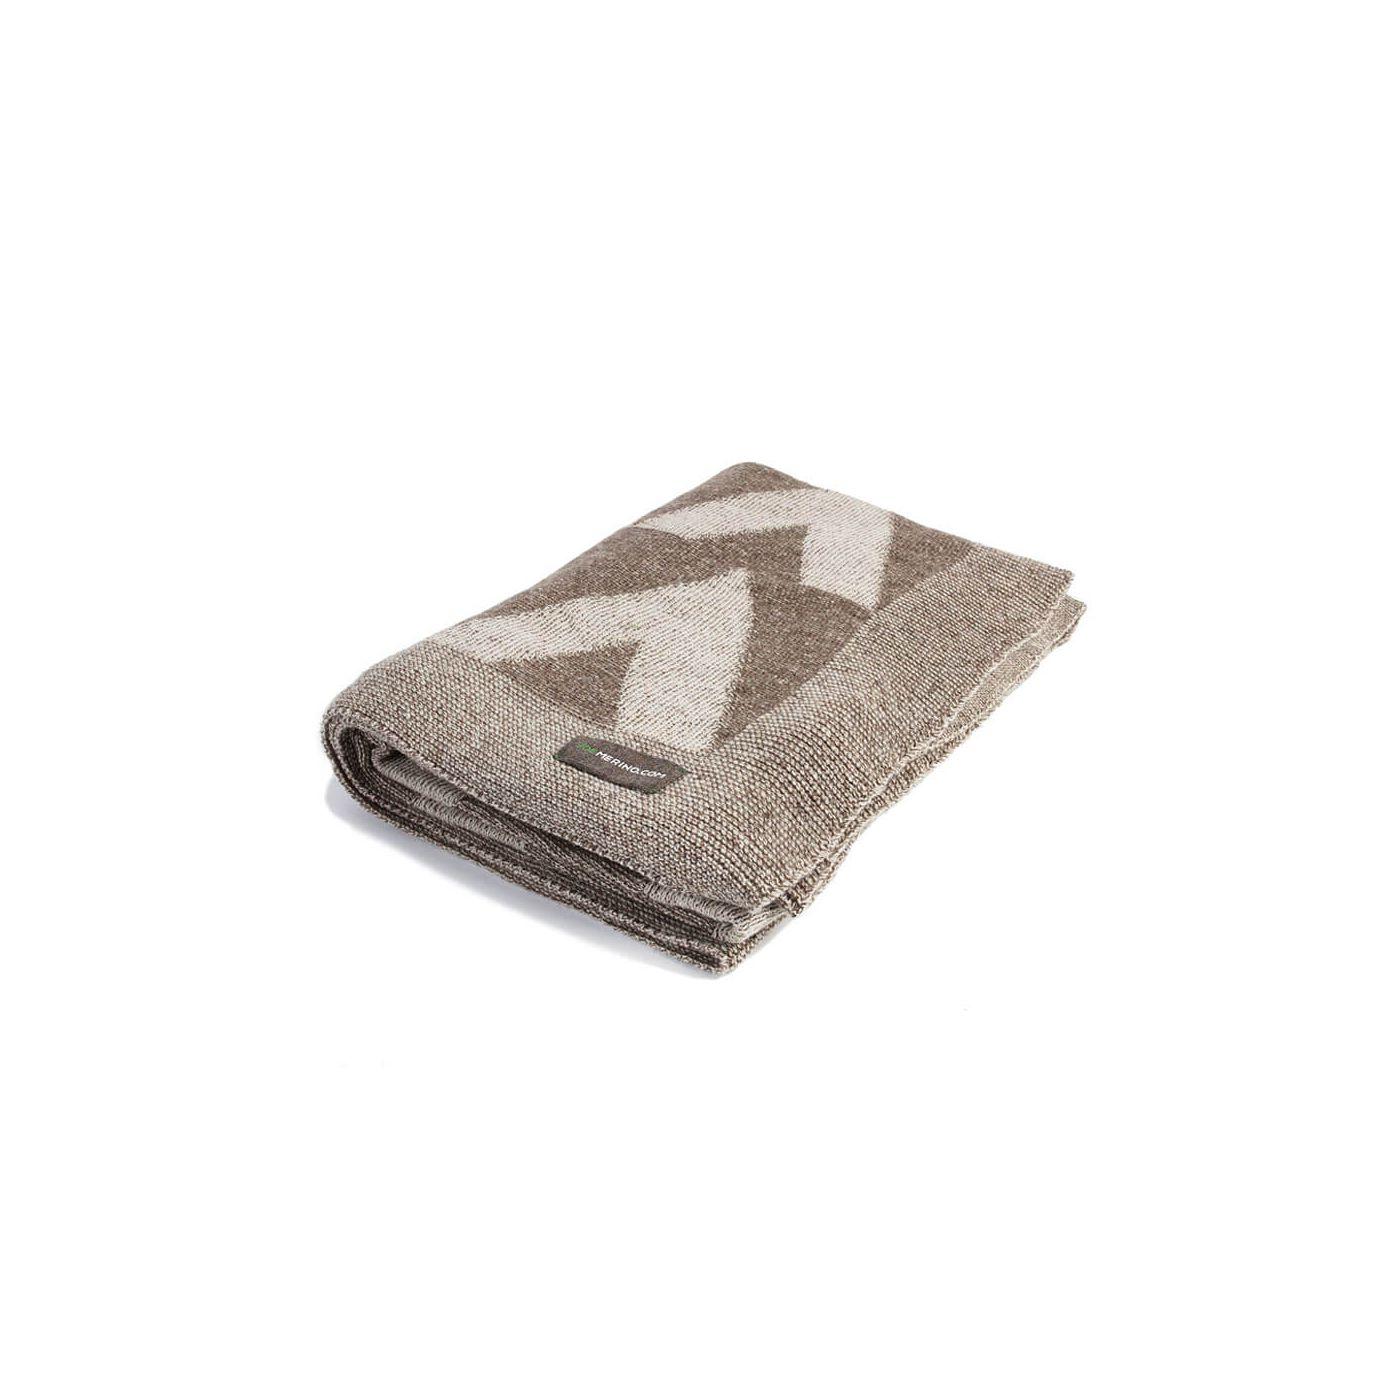 Plaid for men made of Merino wool in Beige